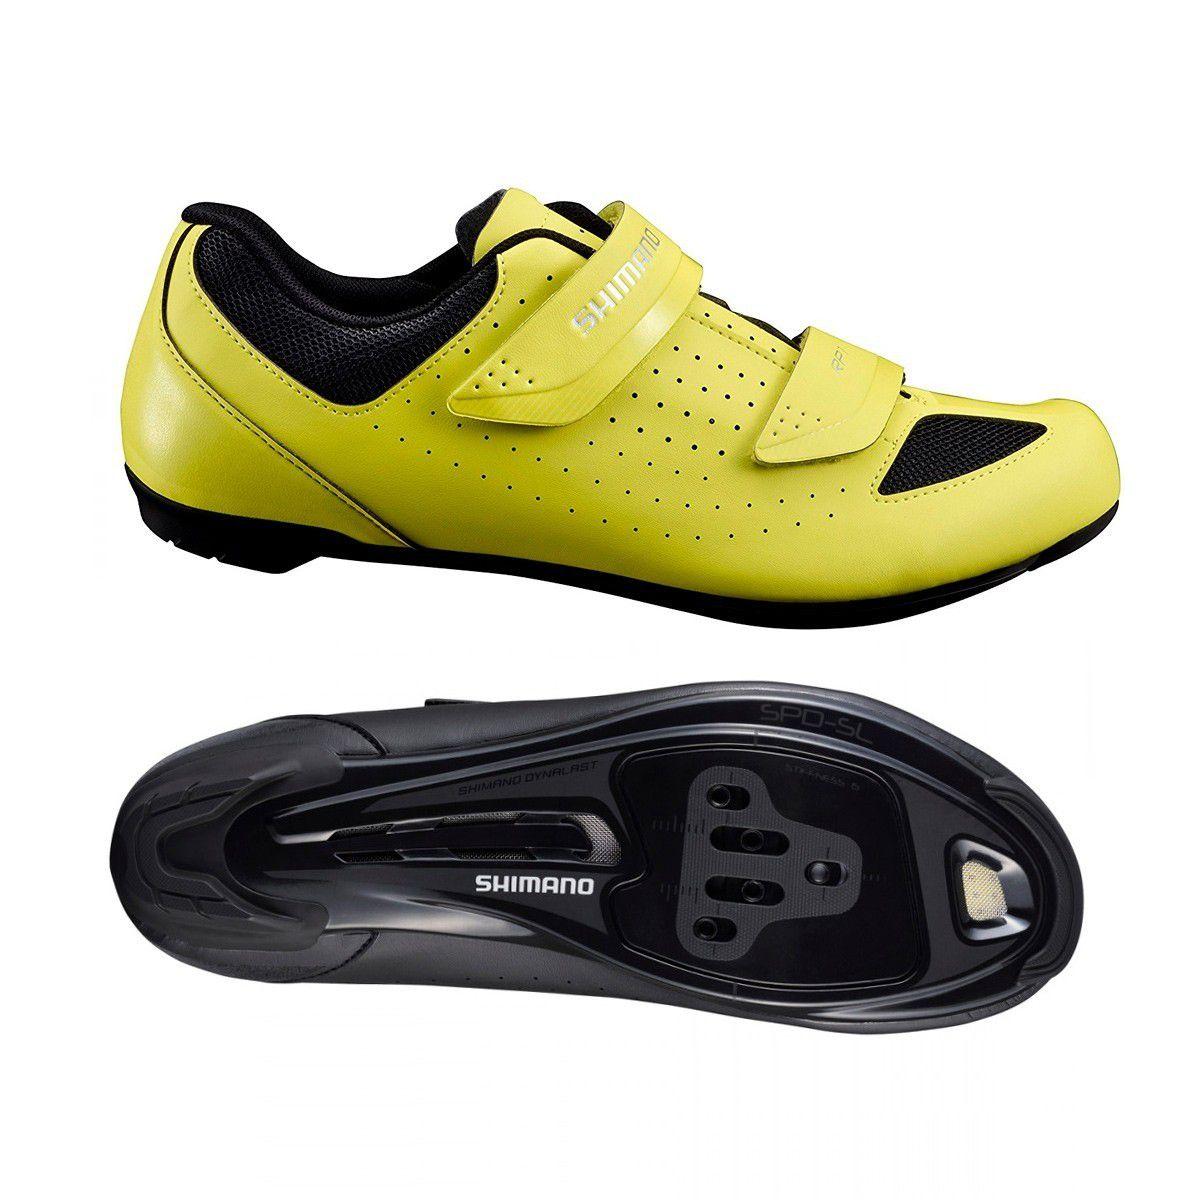 Sapatilha Speed Shimano Rp1 Amarela Neon + Pedal RS500 + Taco